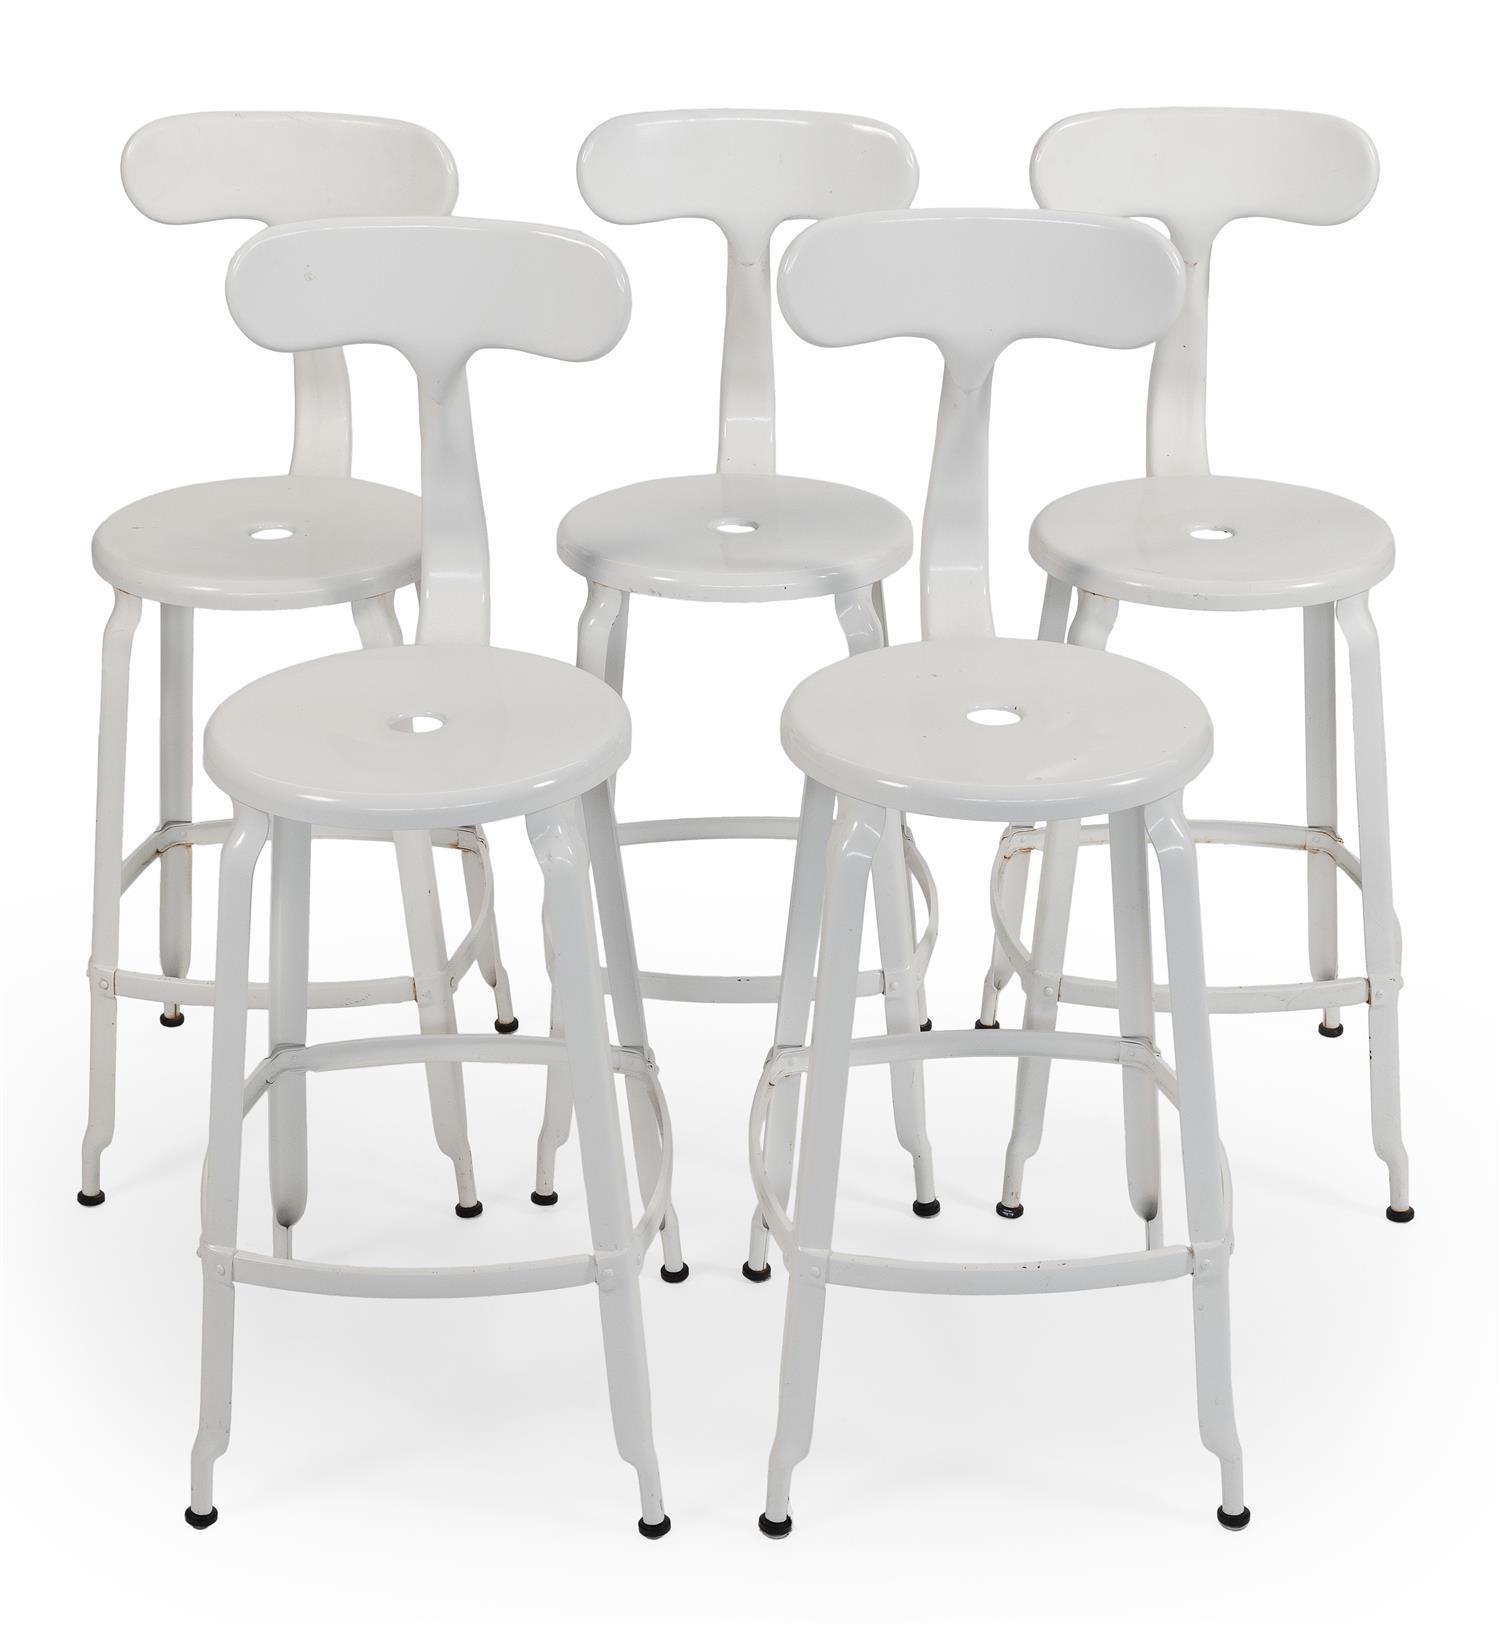 "FIVE RESTORATION HARDWARE T-BACK STOOLS White enameled metal. Back heights 38.5"". Seat heights 25.5""."